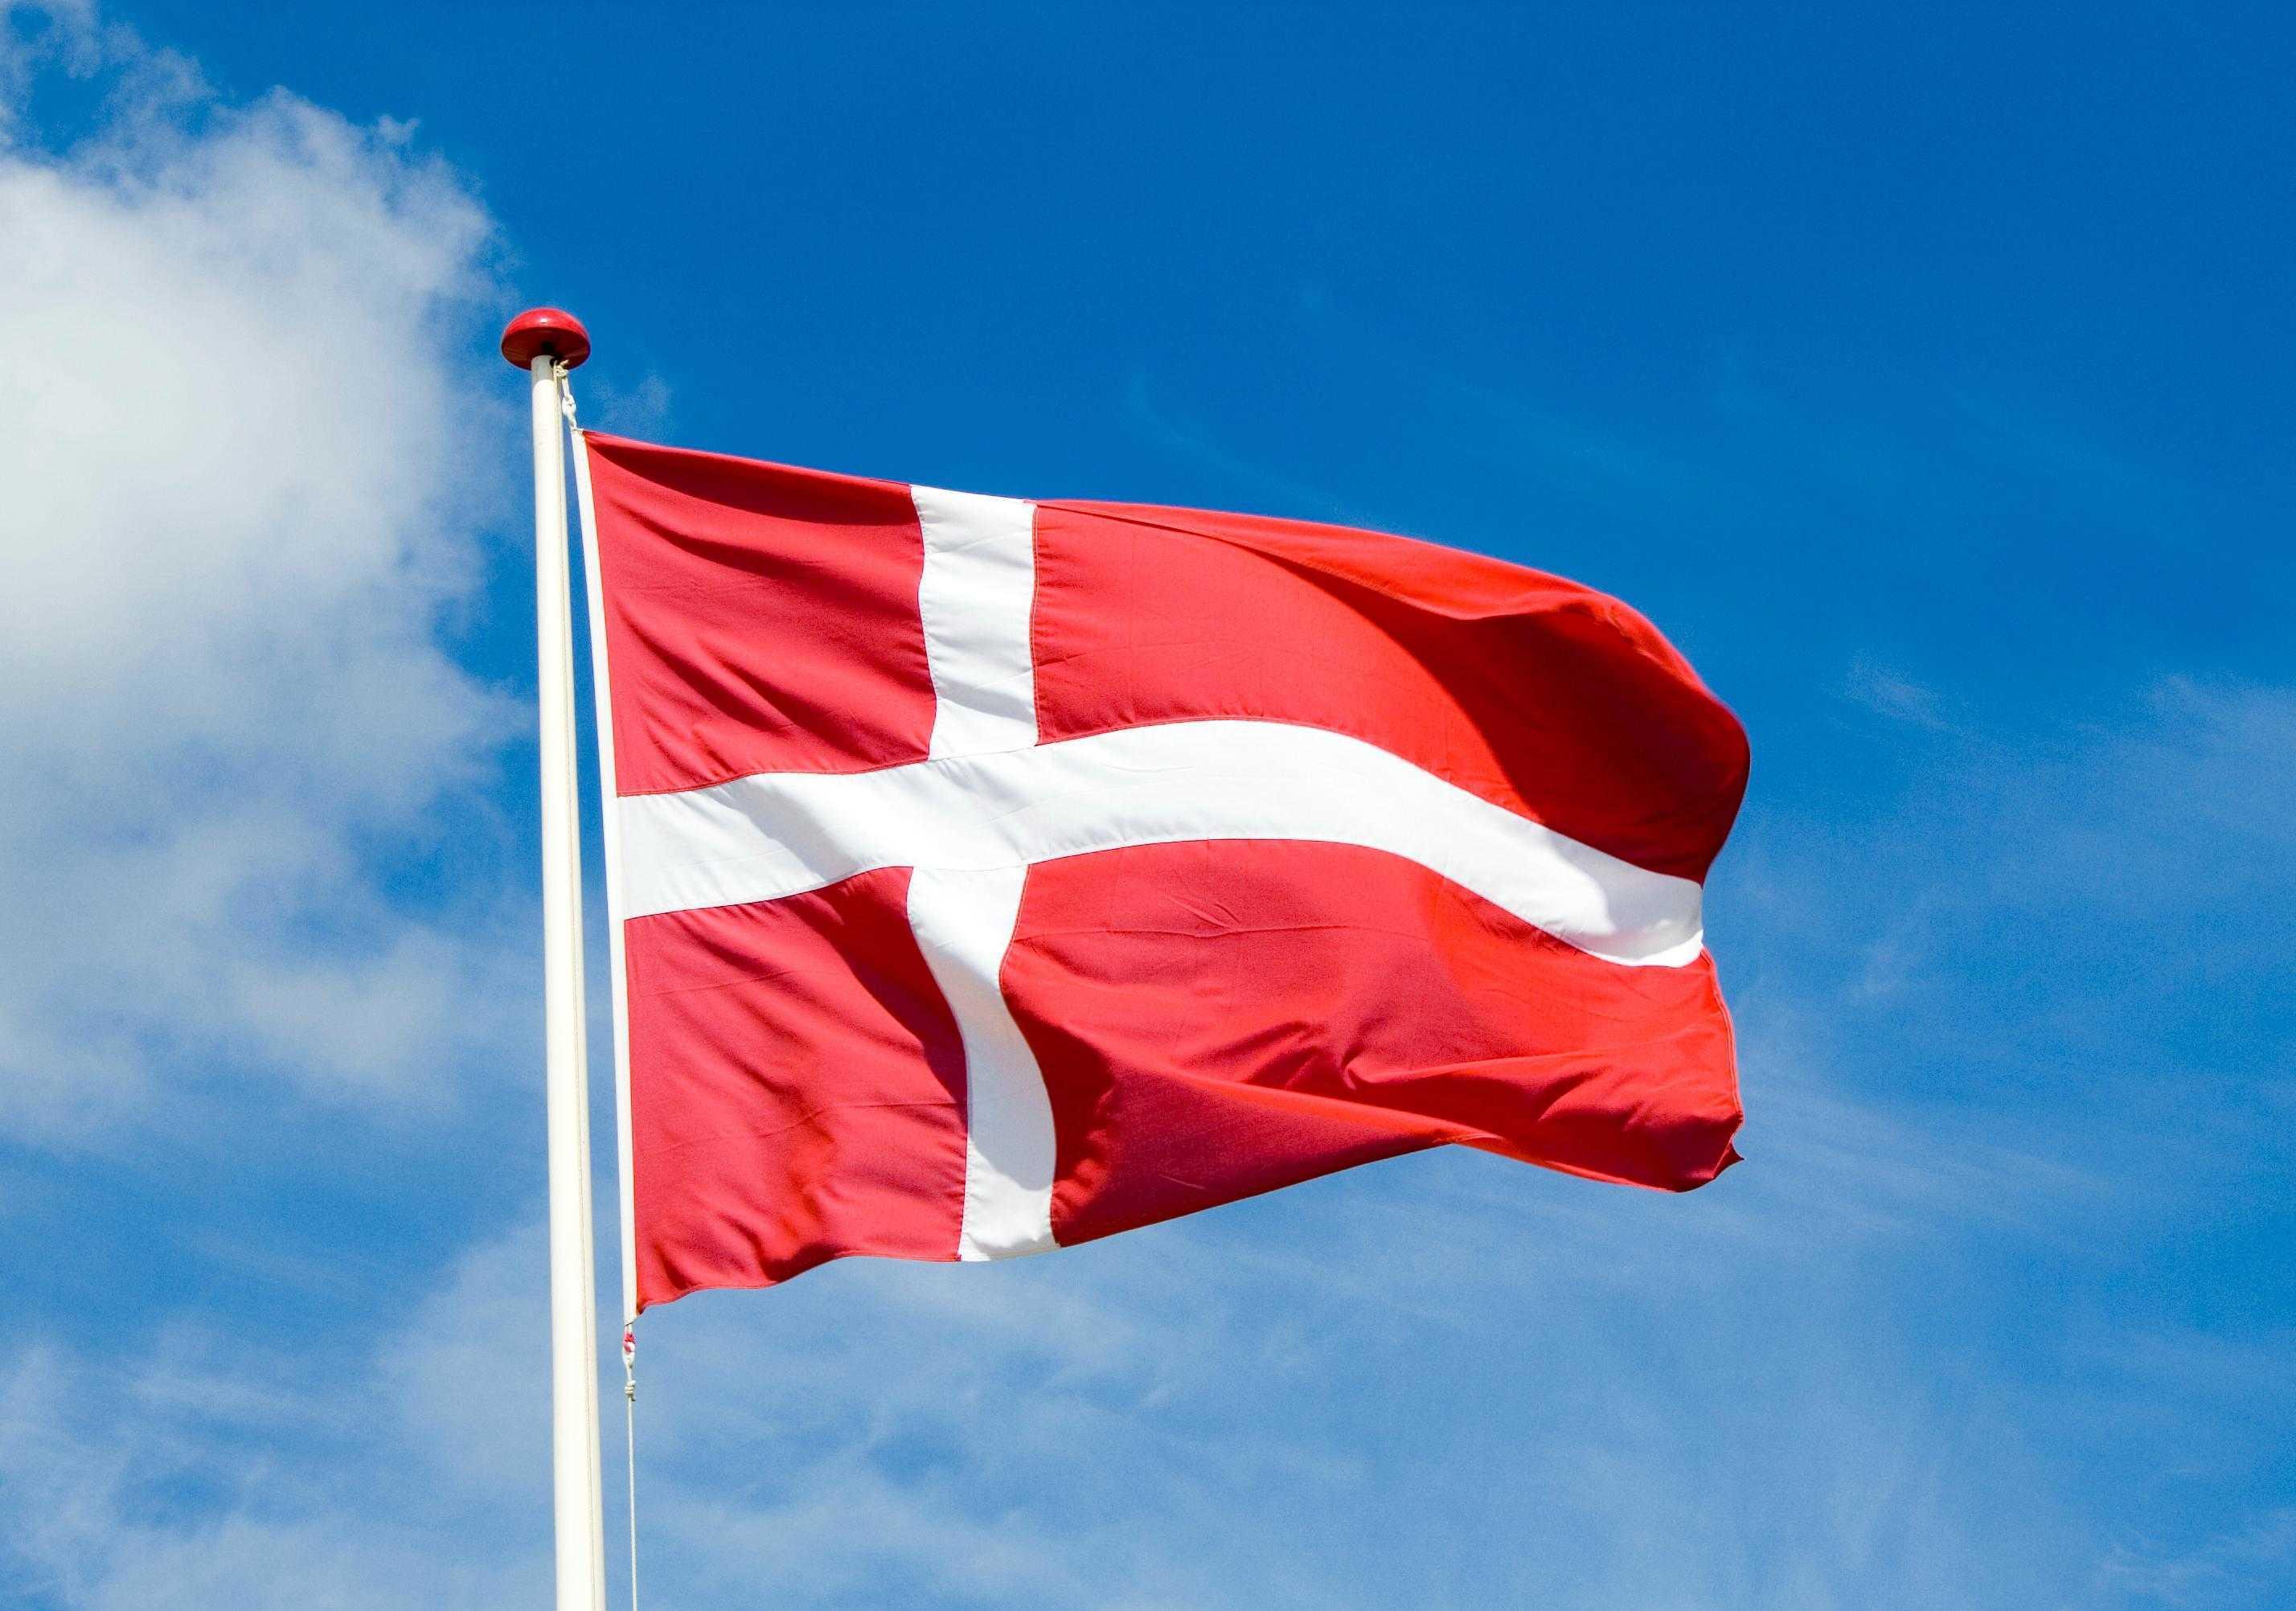 Nación Cannabis | Compañías impulsan la aprobación de cultivo de cannabis en Dinamarca